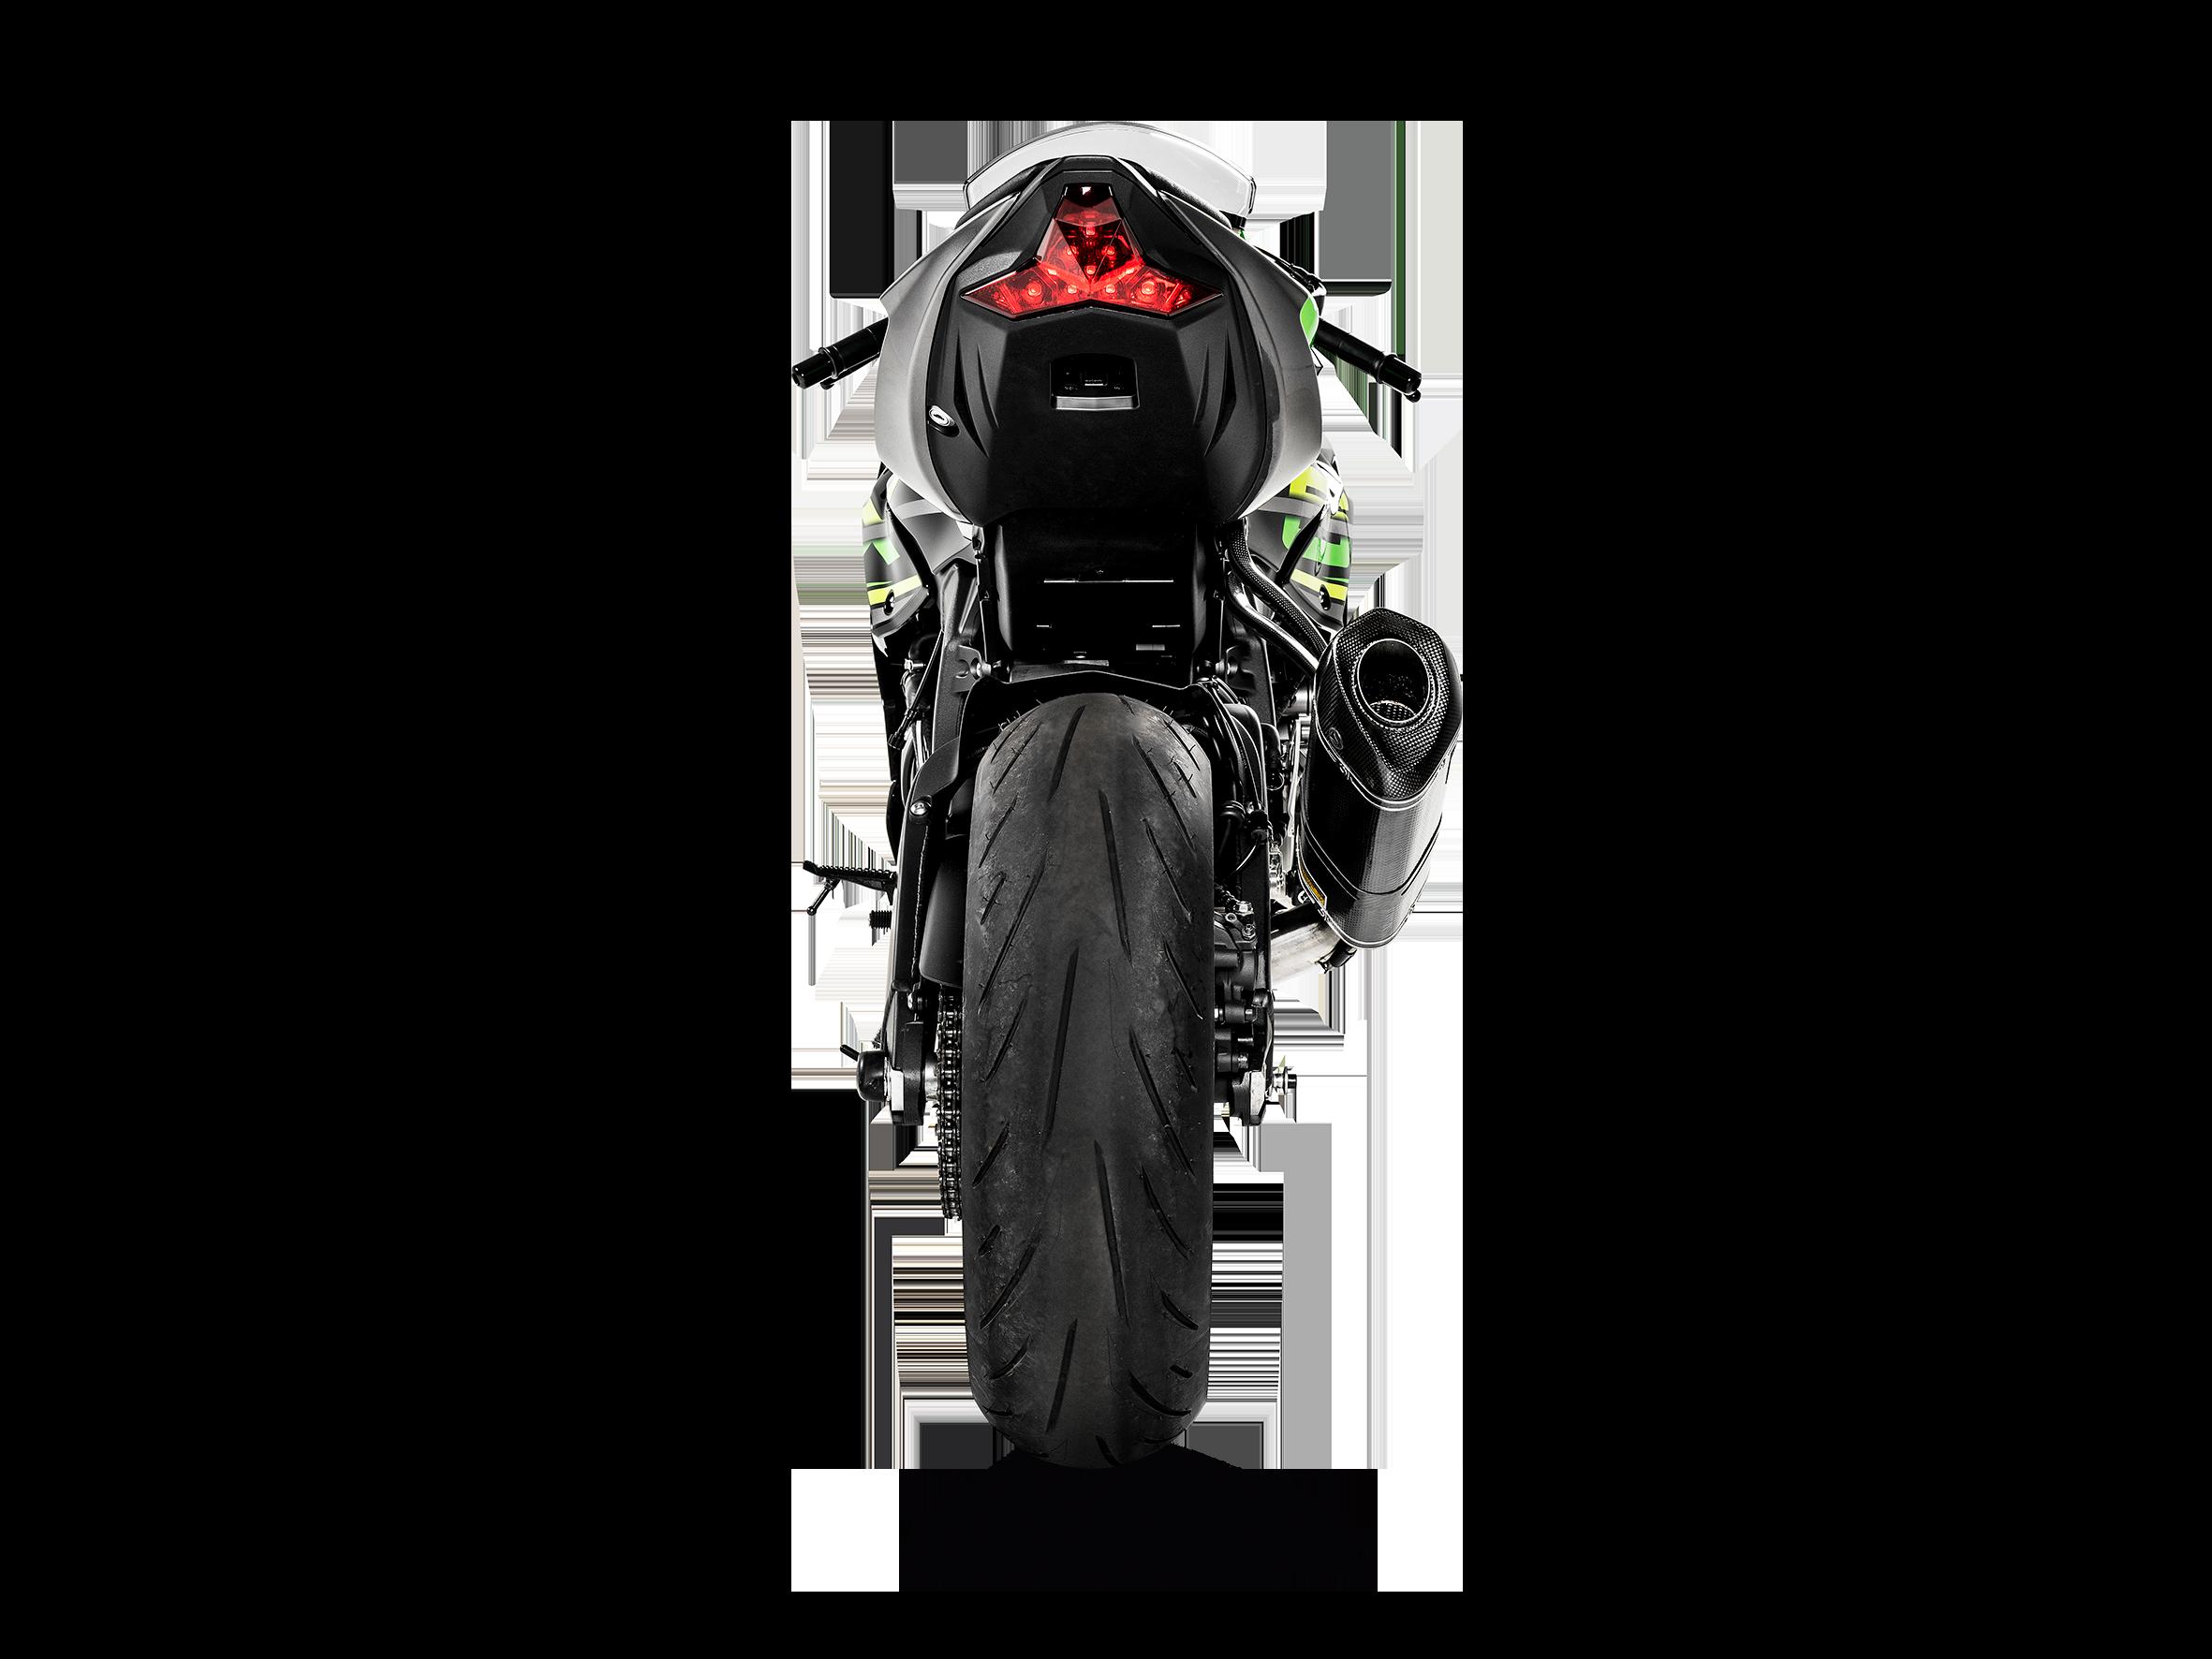 Kawasaki Ninja Zx 6r 636 2020 Racing Line Carbon Akrapovic Motorcycle Exhaust